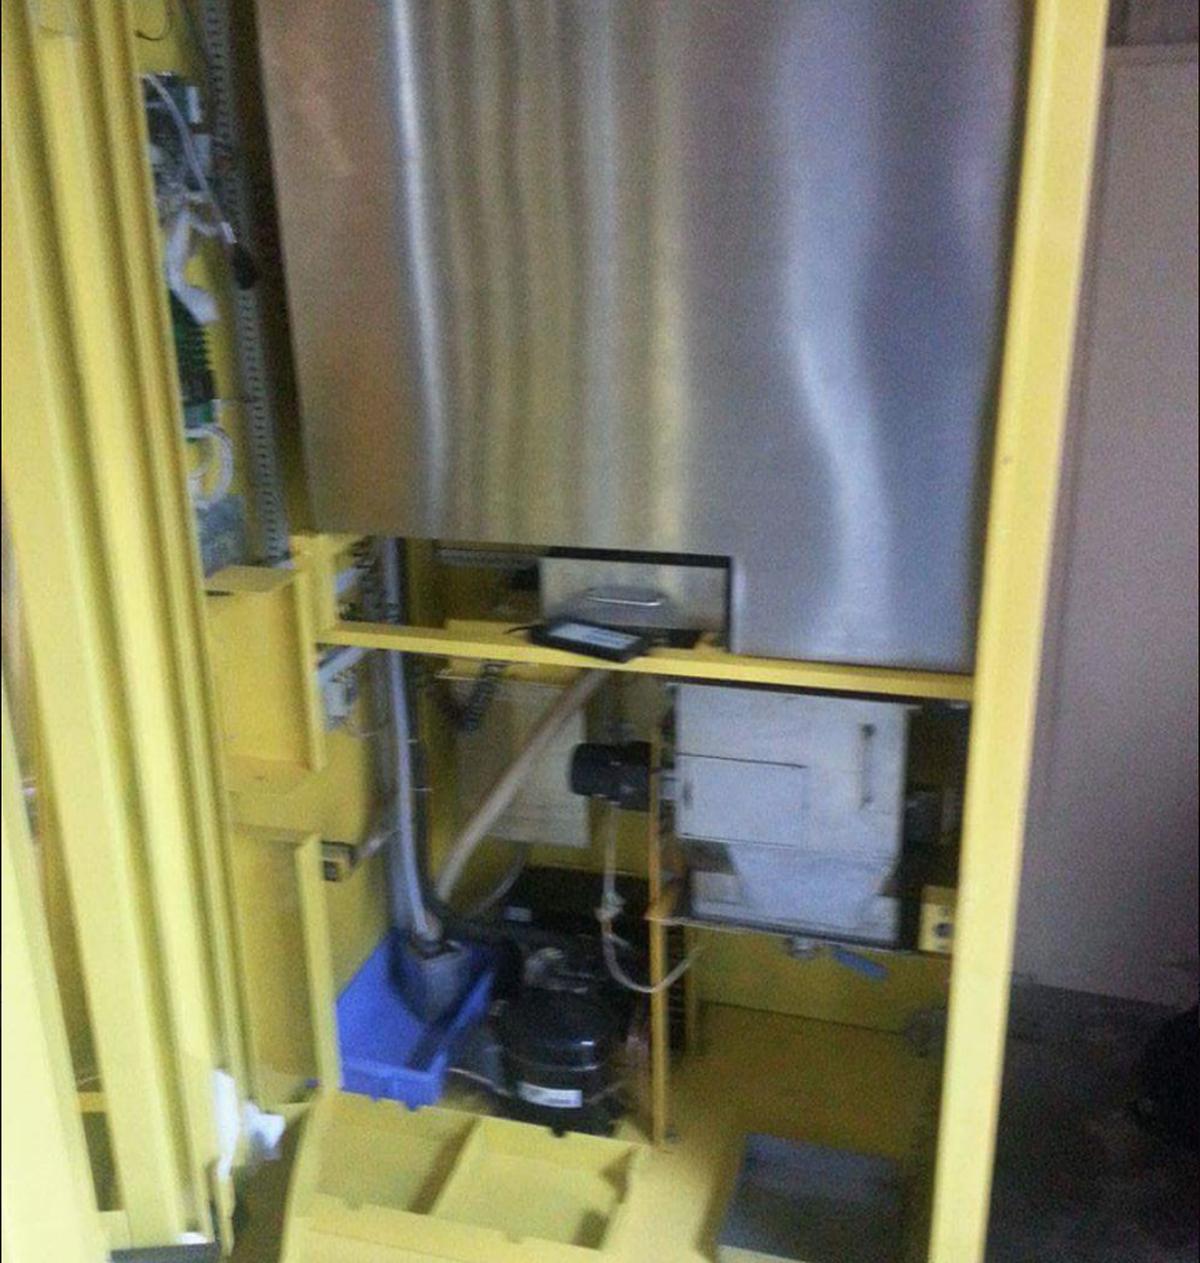 Secondhand Catering Equipment Vending Machines